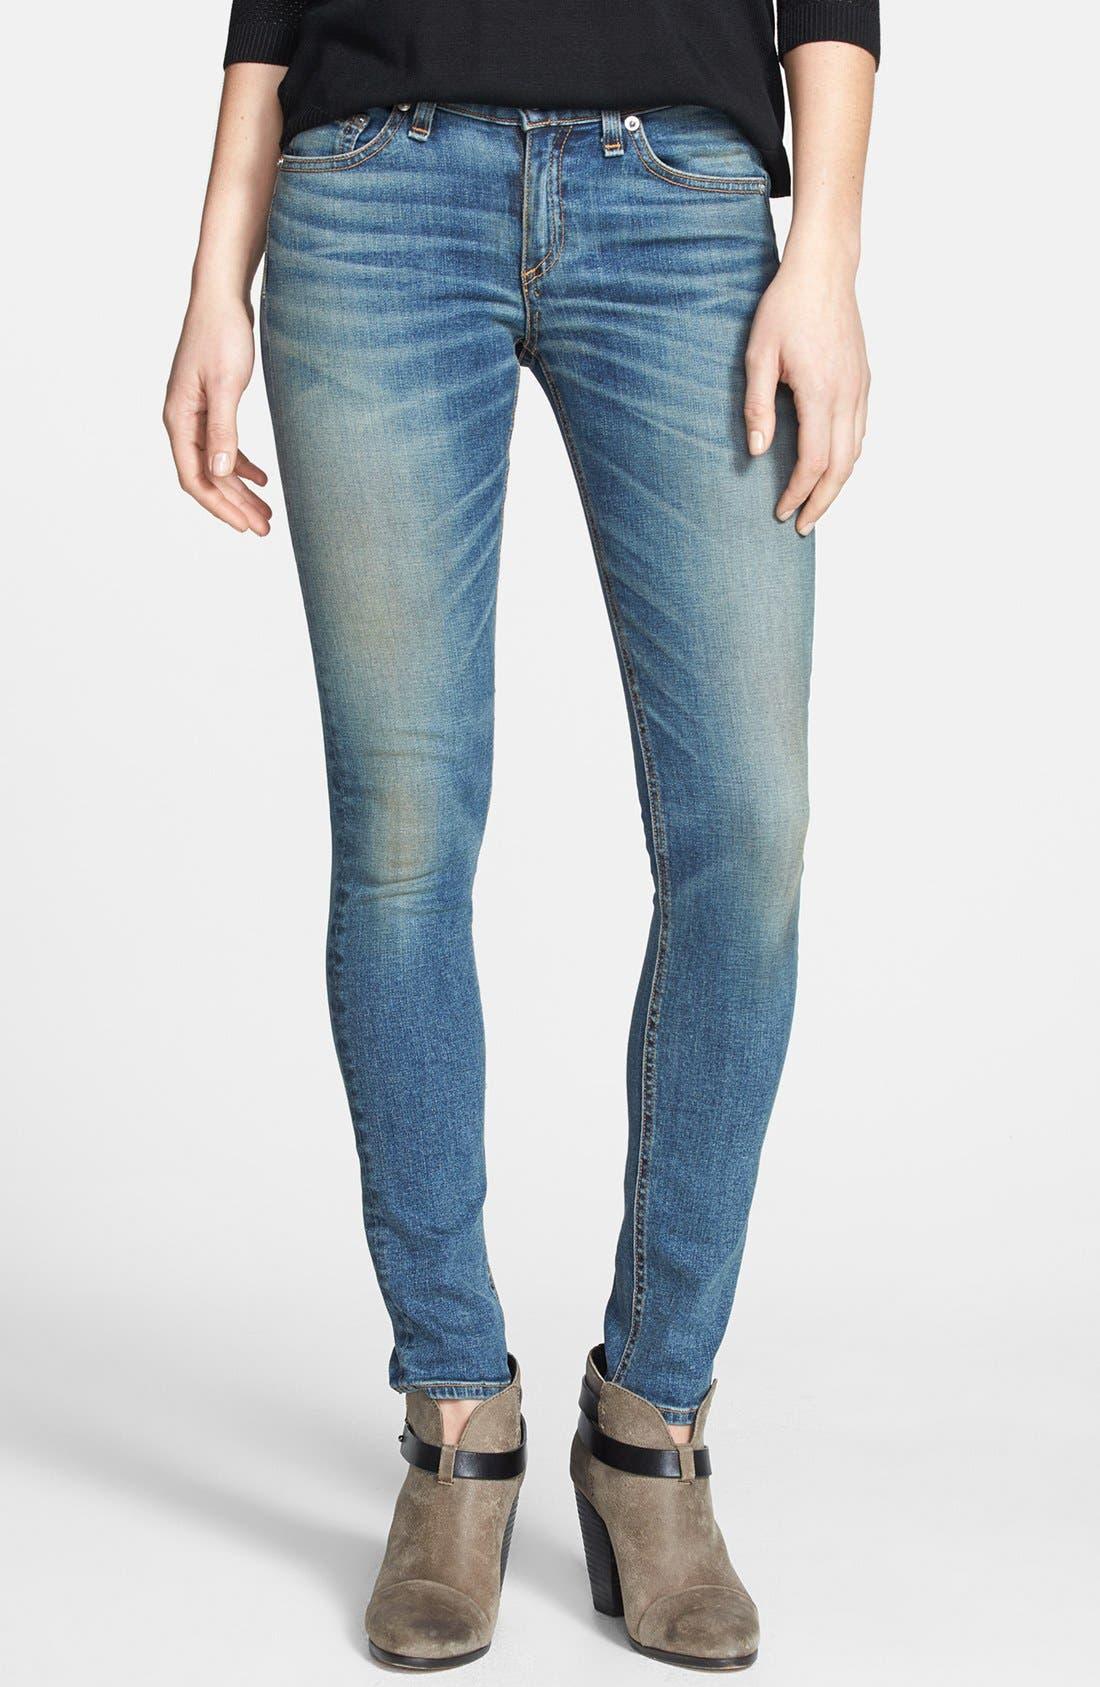 Alternate Image 1 Selected - rag & bone/JEAN Skinny Stretch Jeans (Brimfield)